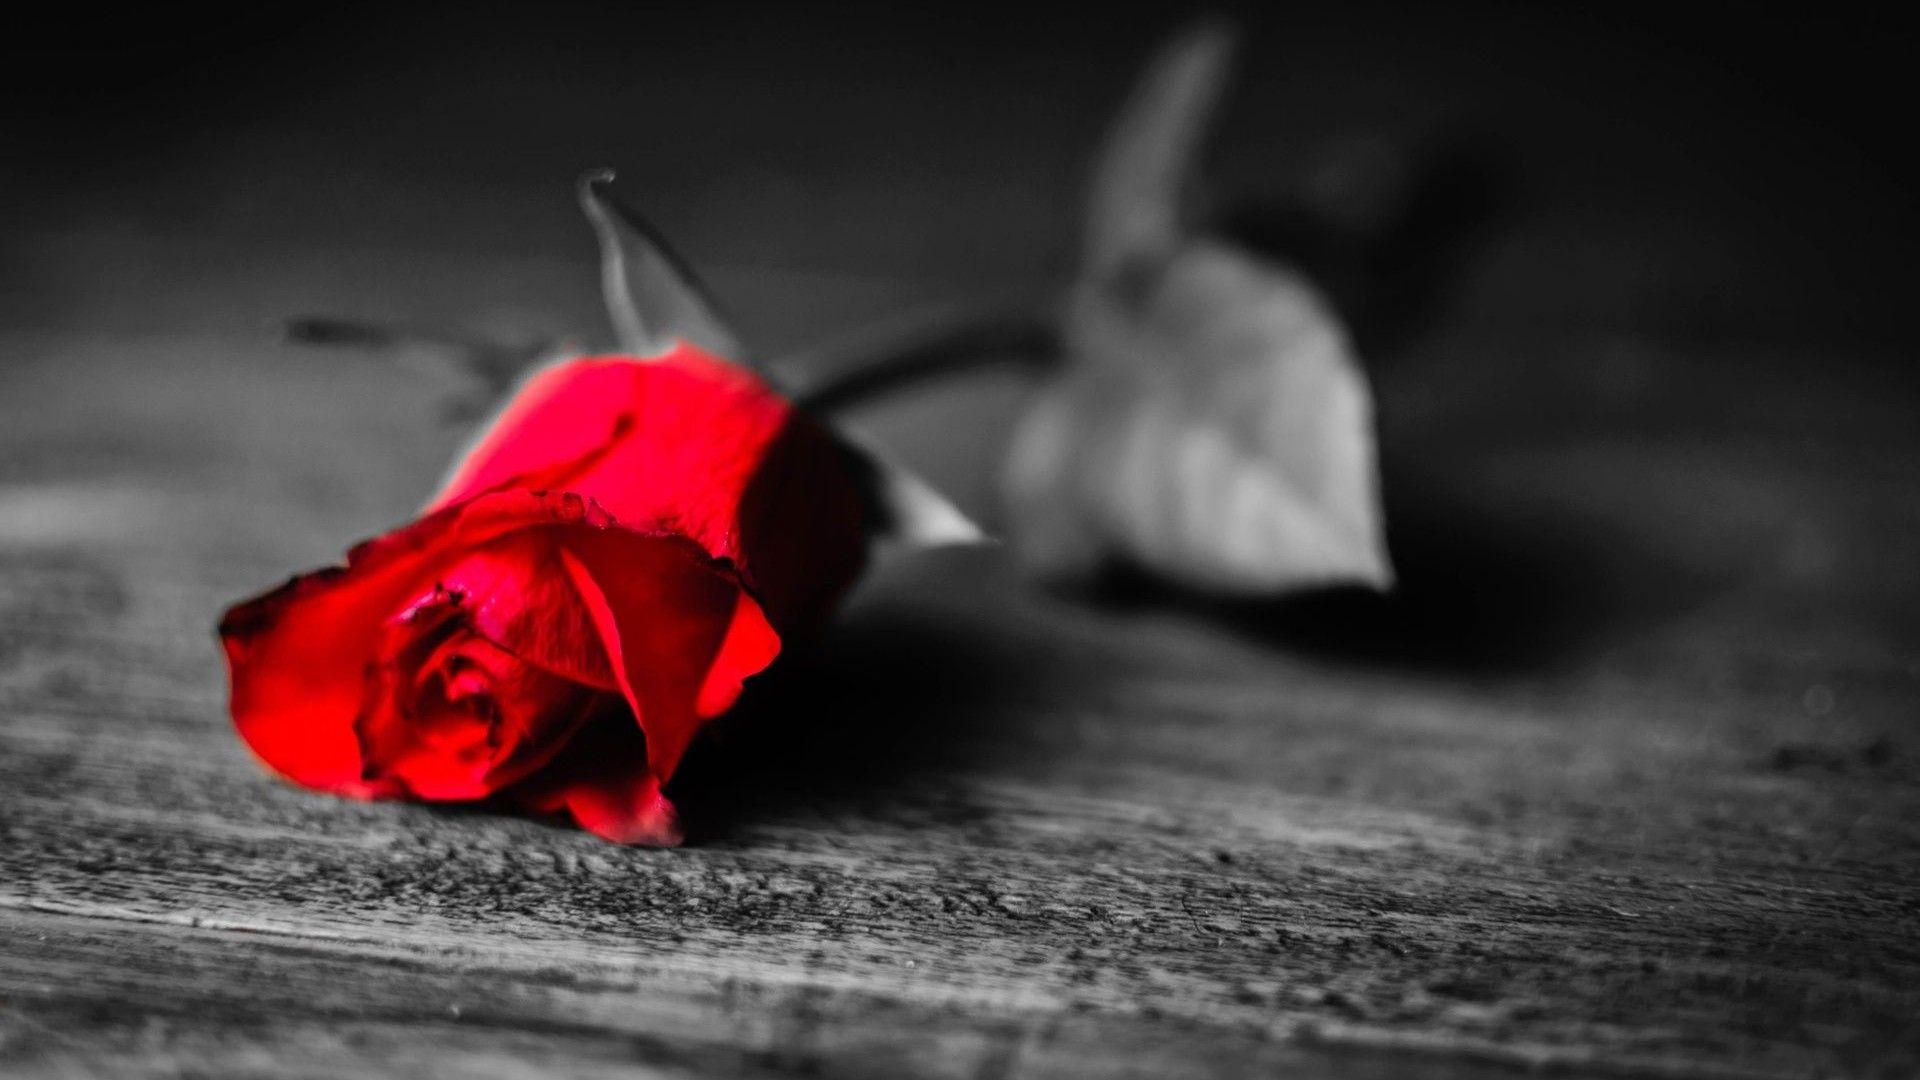 Red Rose Water Drops - Flowers Wallpapers Wallpaperway.